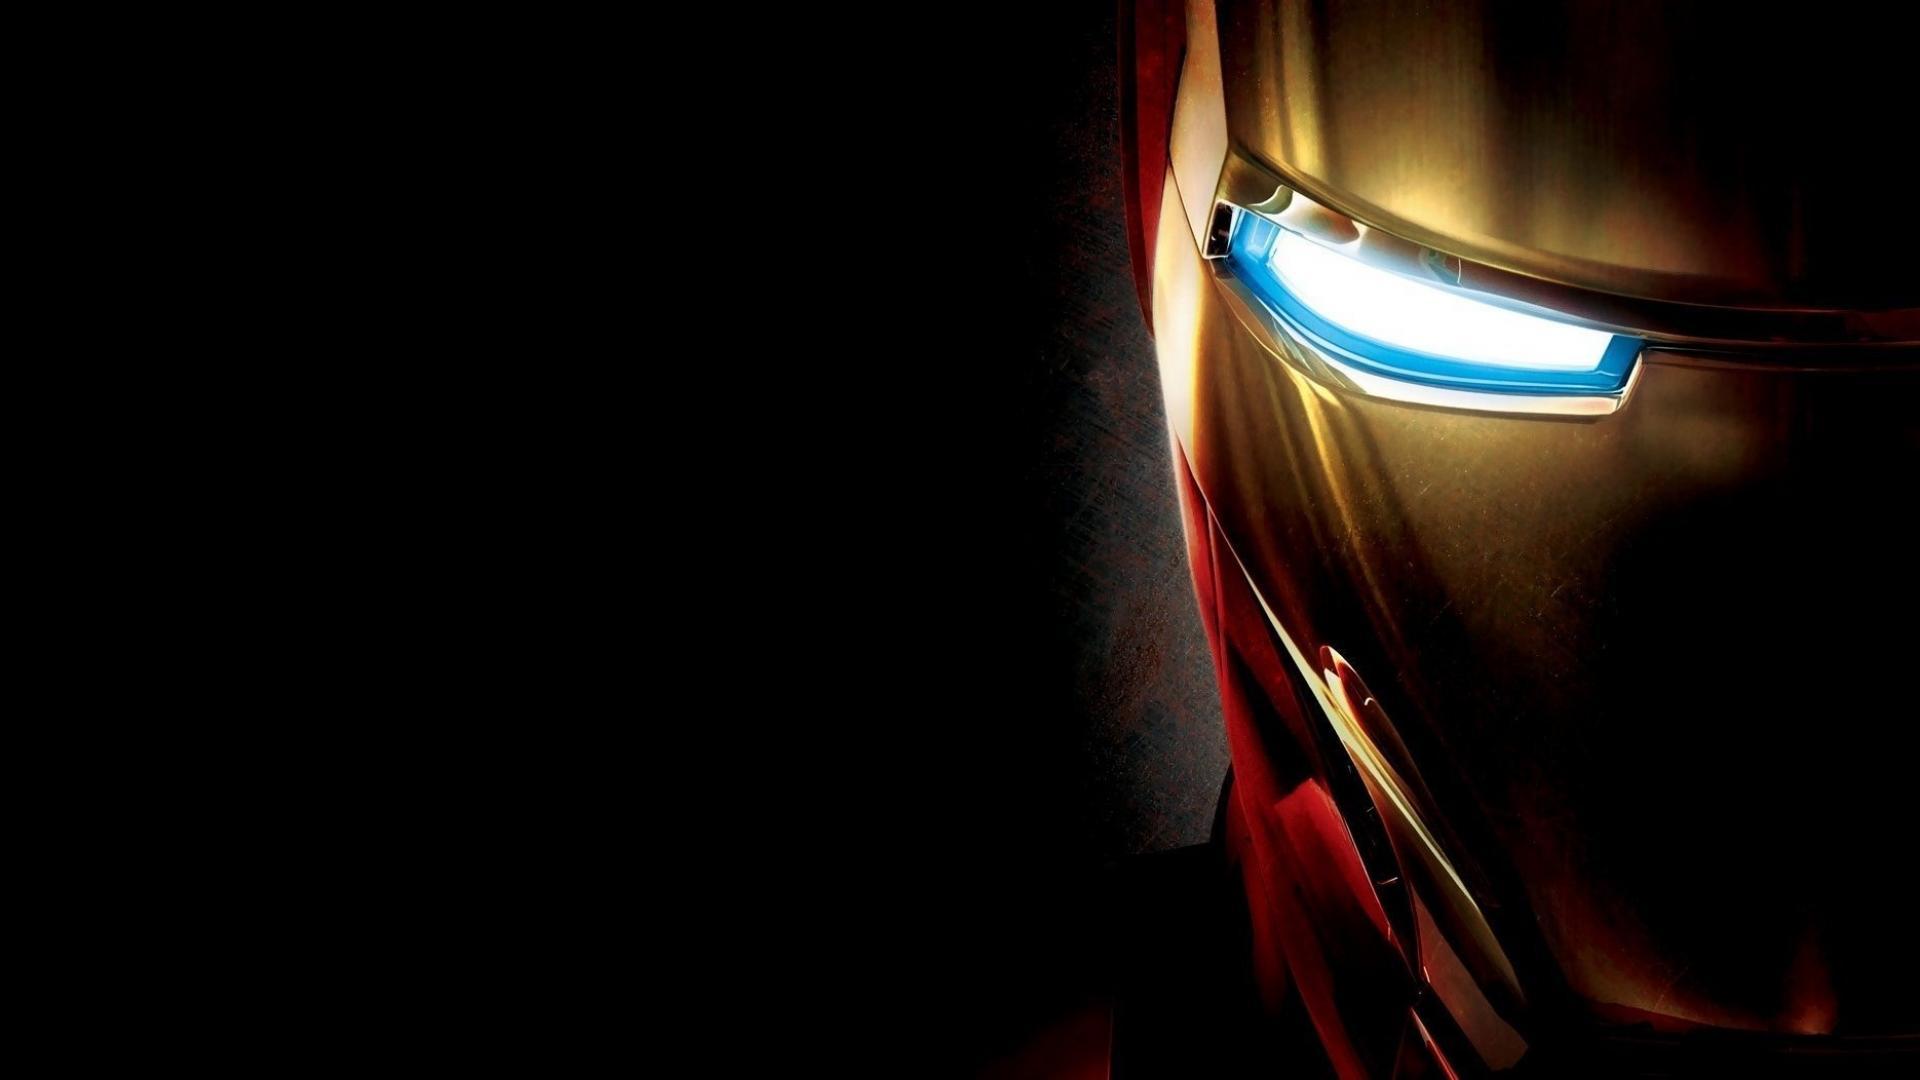 Iron Man simple Face | Full HD Desktop Wallpapers 1080p